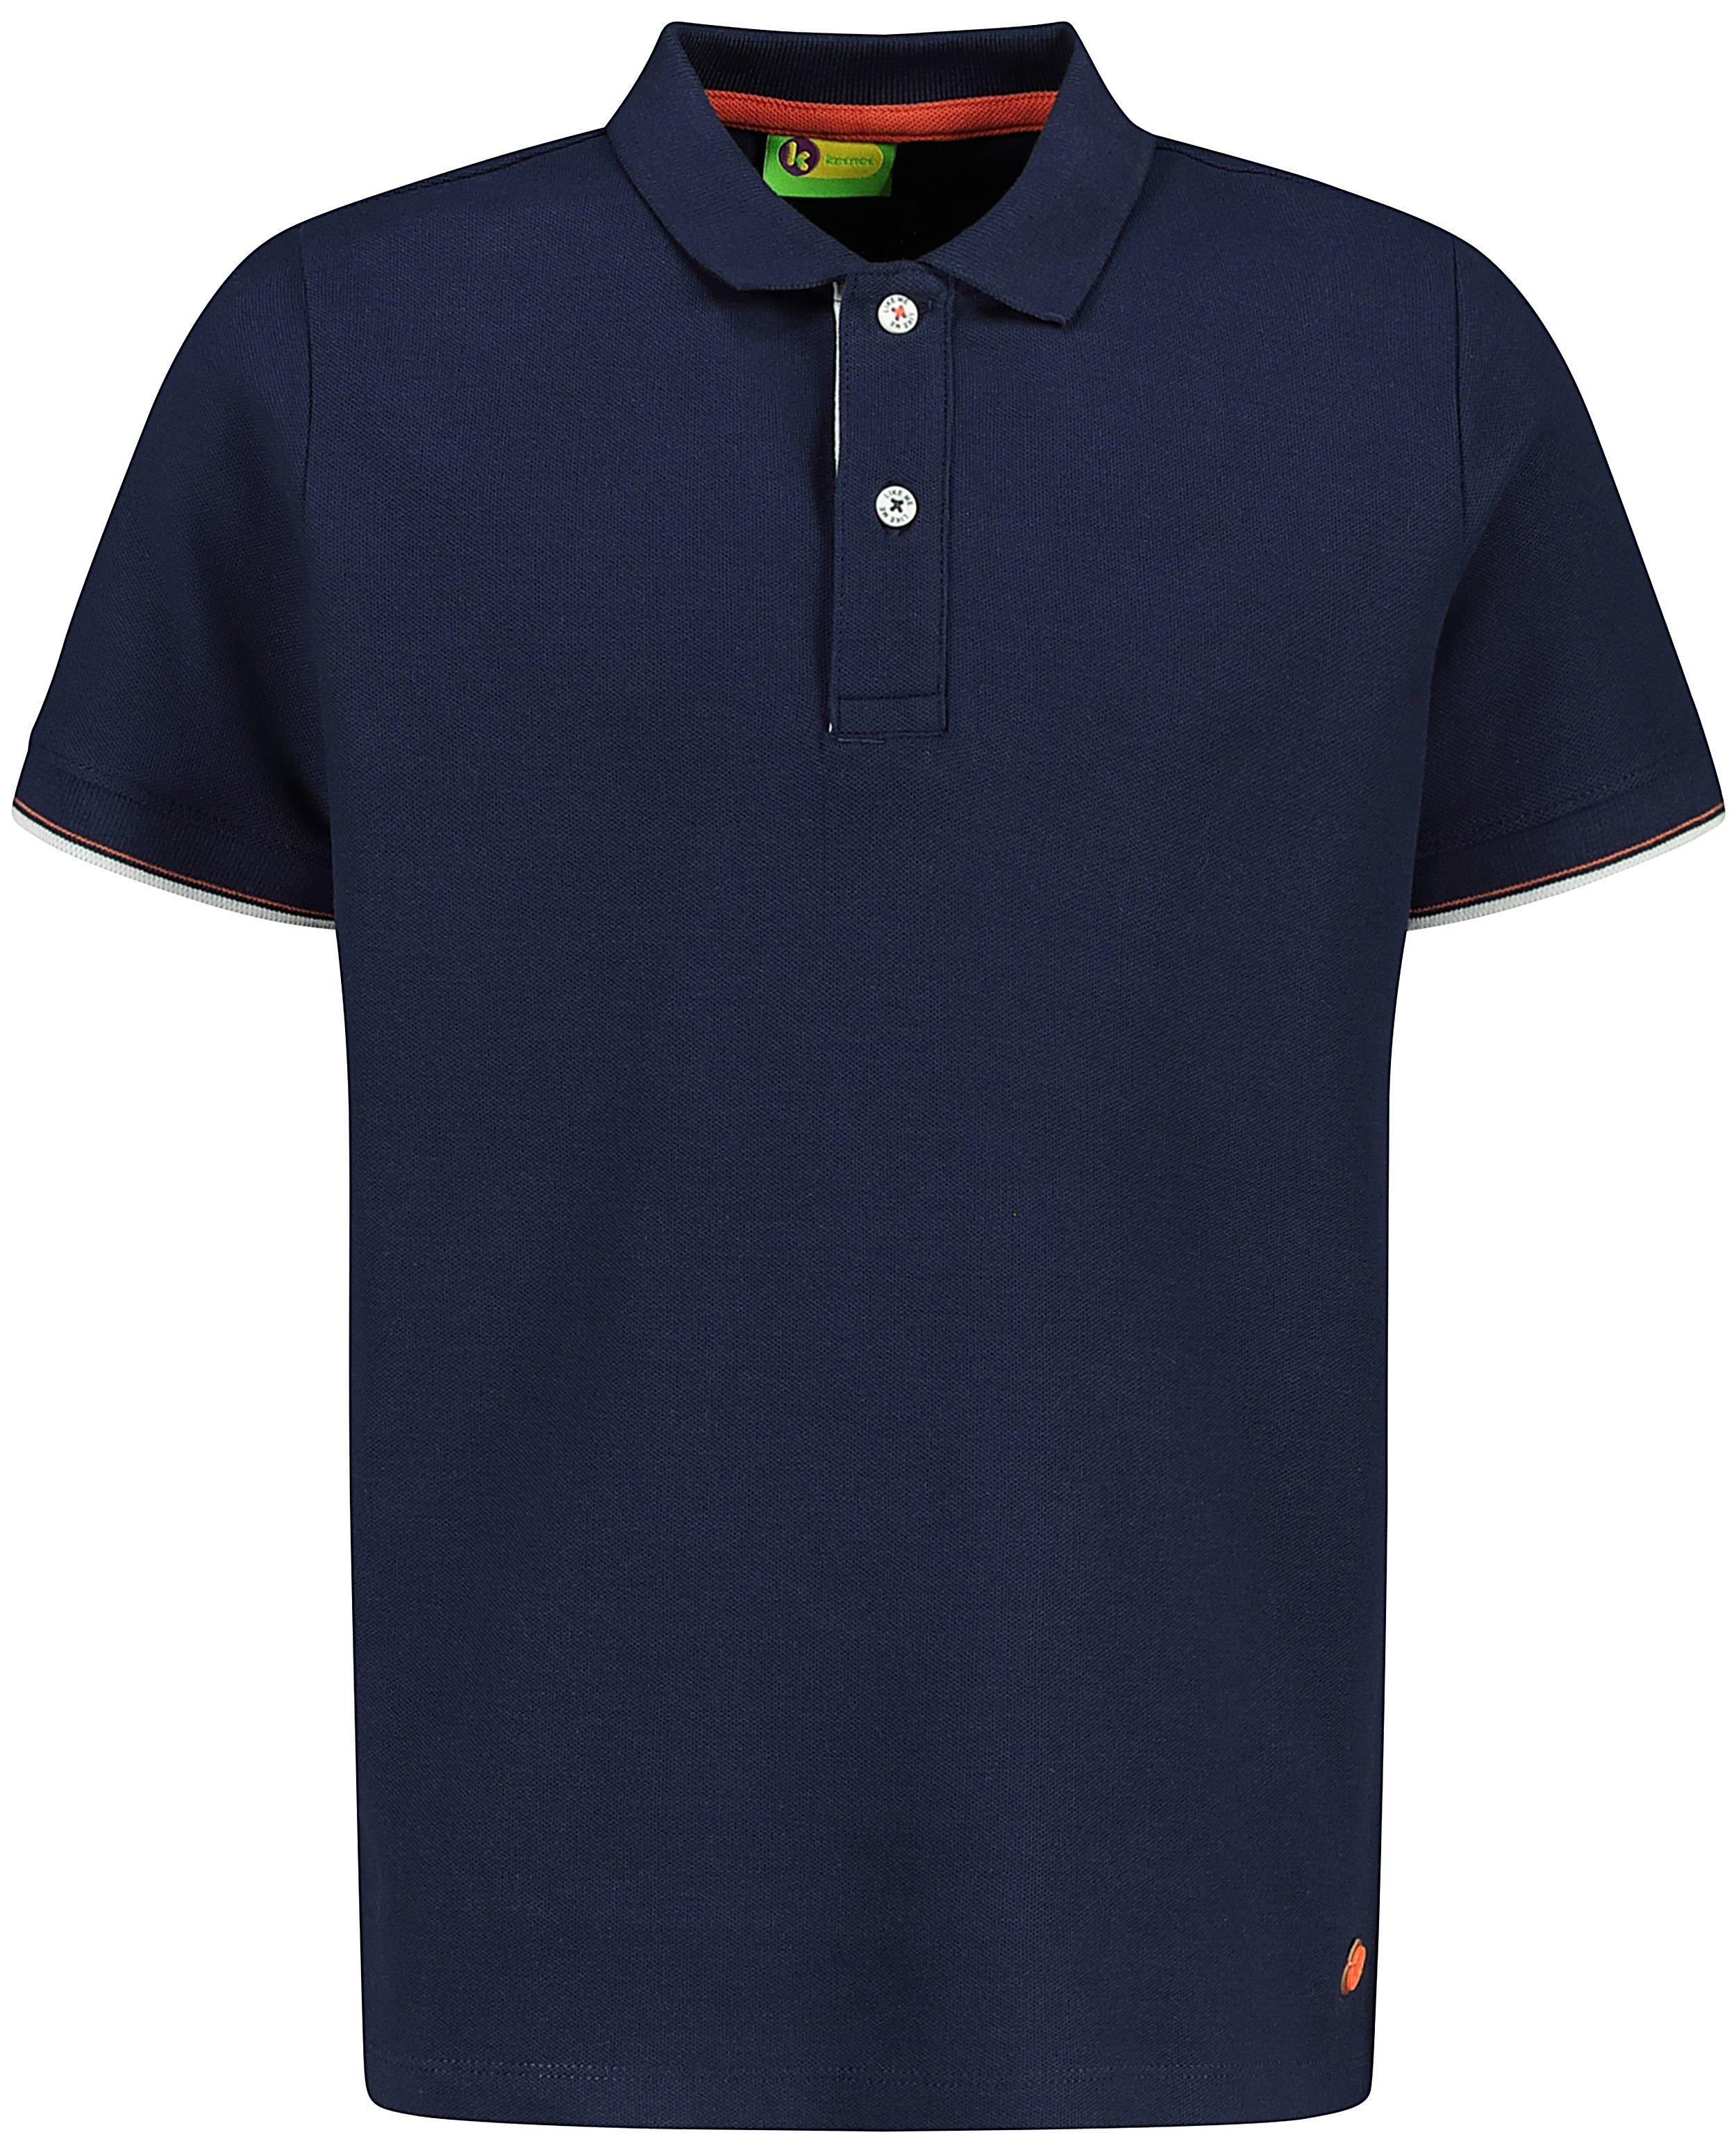 Polo's - Blauwe polo #LikeMe